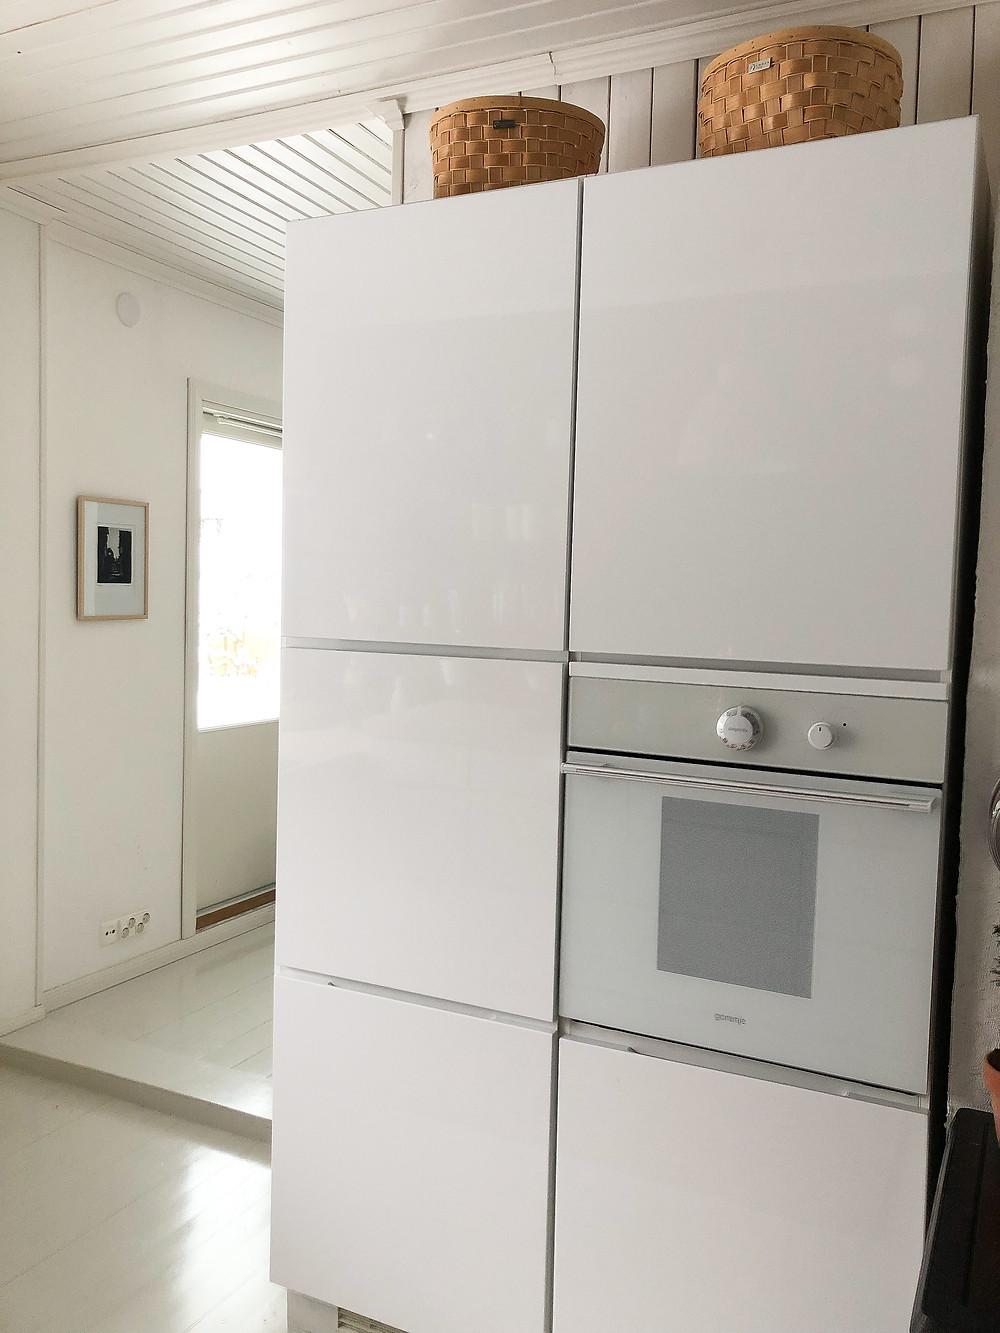 Kvik Mano Integroitu jääkaappi, Kvik Mano integrated refrigerator